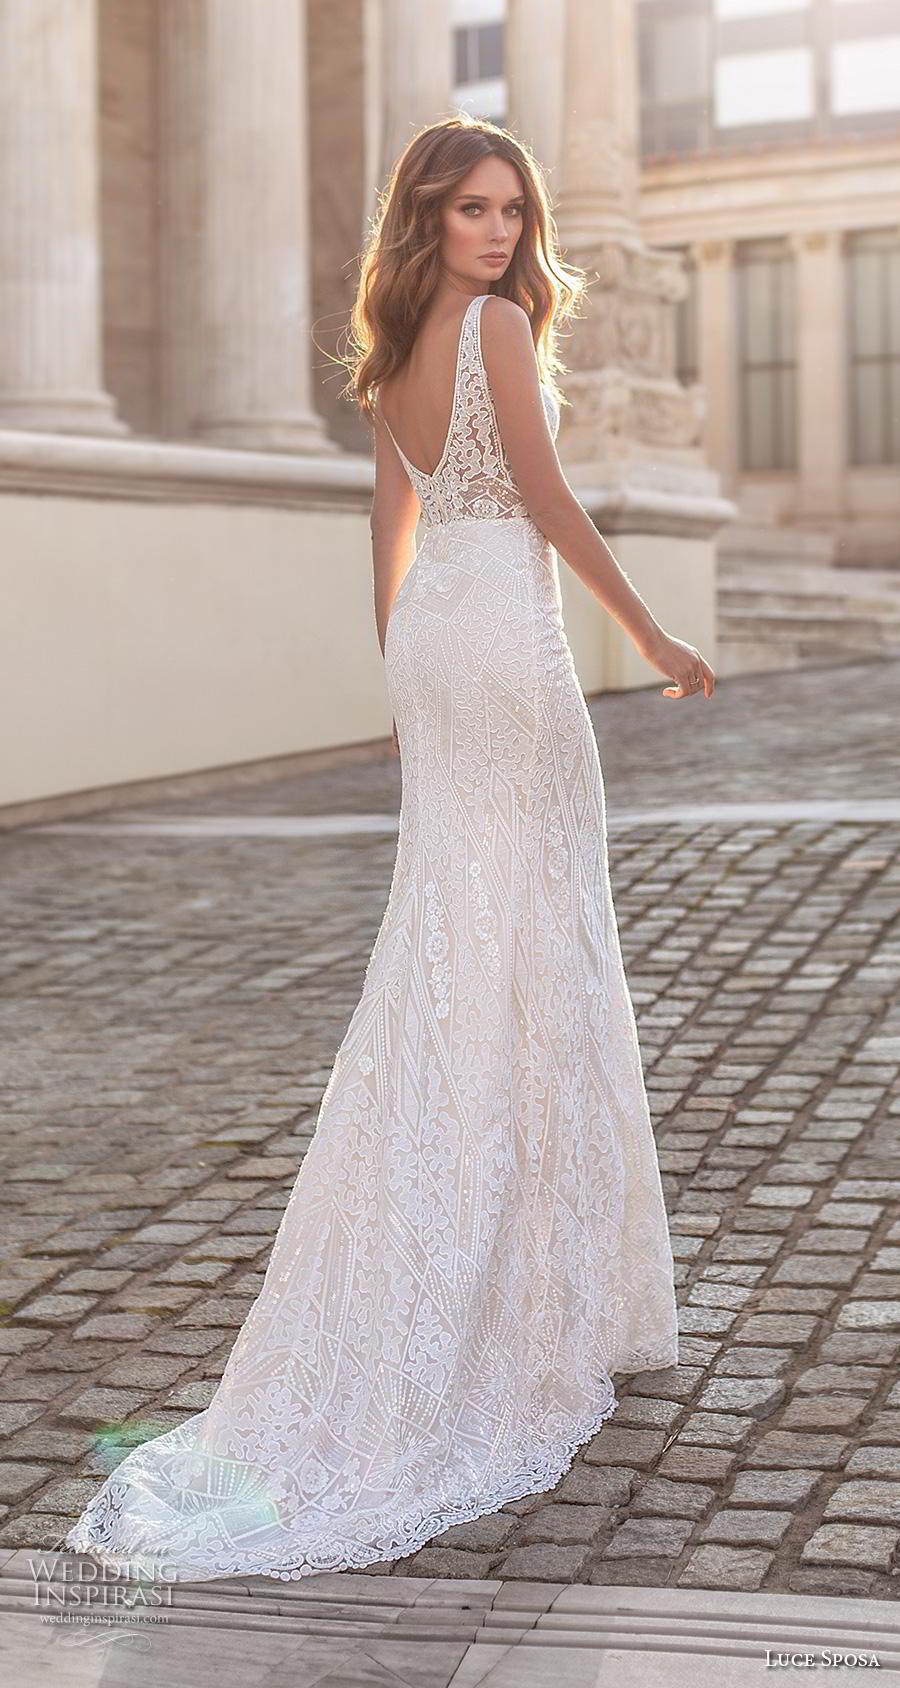 luce sposa 2020 bridal sleeveless strap v neck full embellishment elegant fit and flare sheath wedding dress v back short train (10) bv